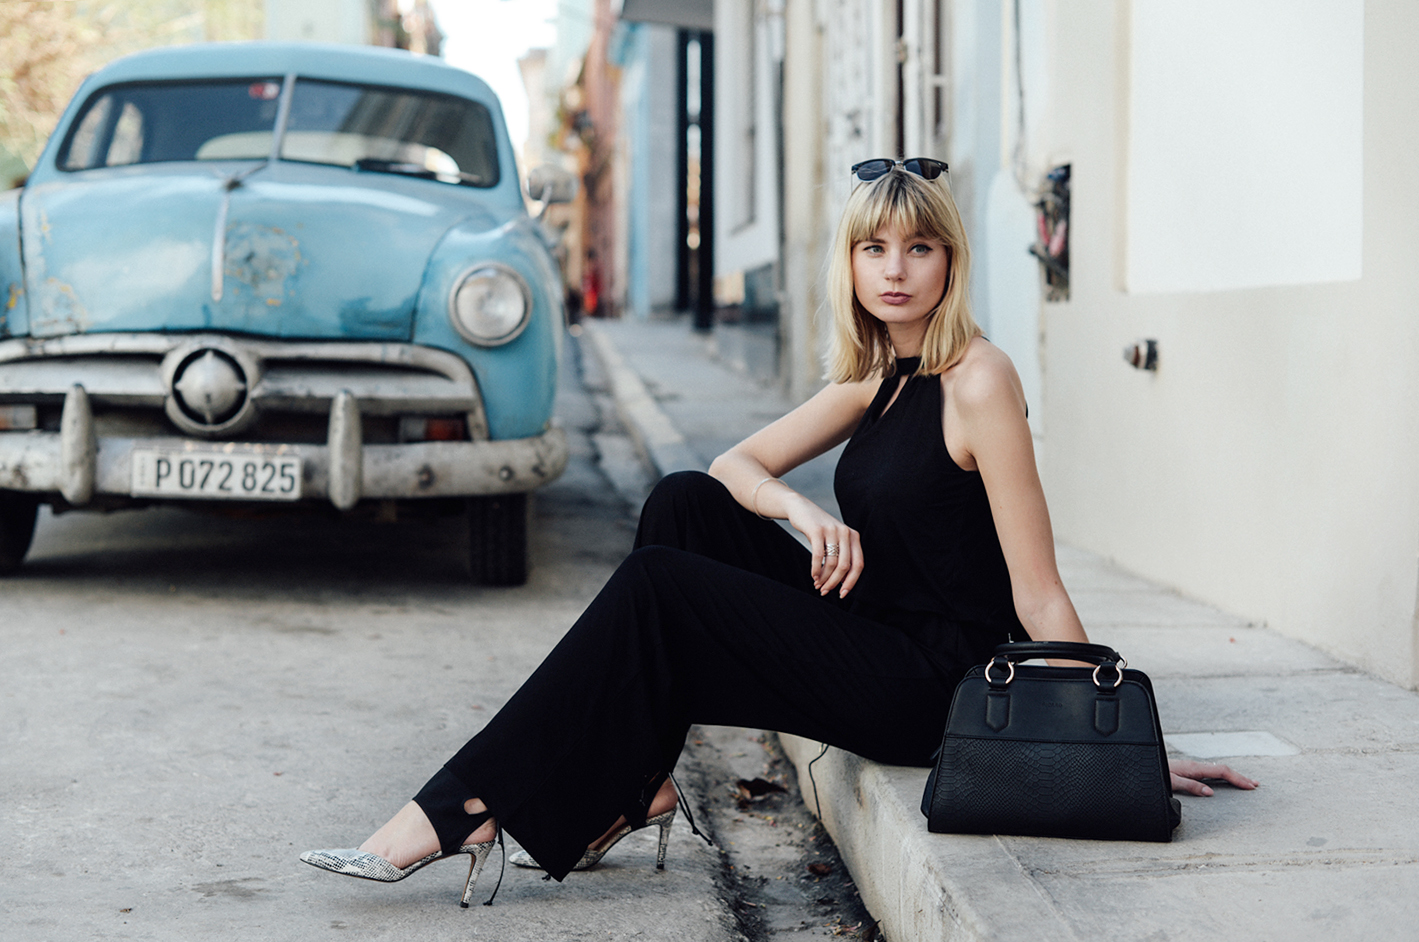 Kiamisu_Modeblog_Fashionblog_Alba Moda_Jumpsuit_Havanna_La Haban Vieja_Kuba Outfit-final